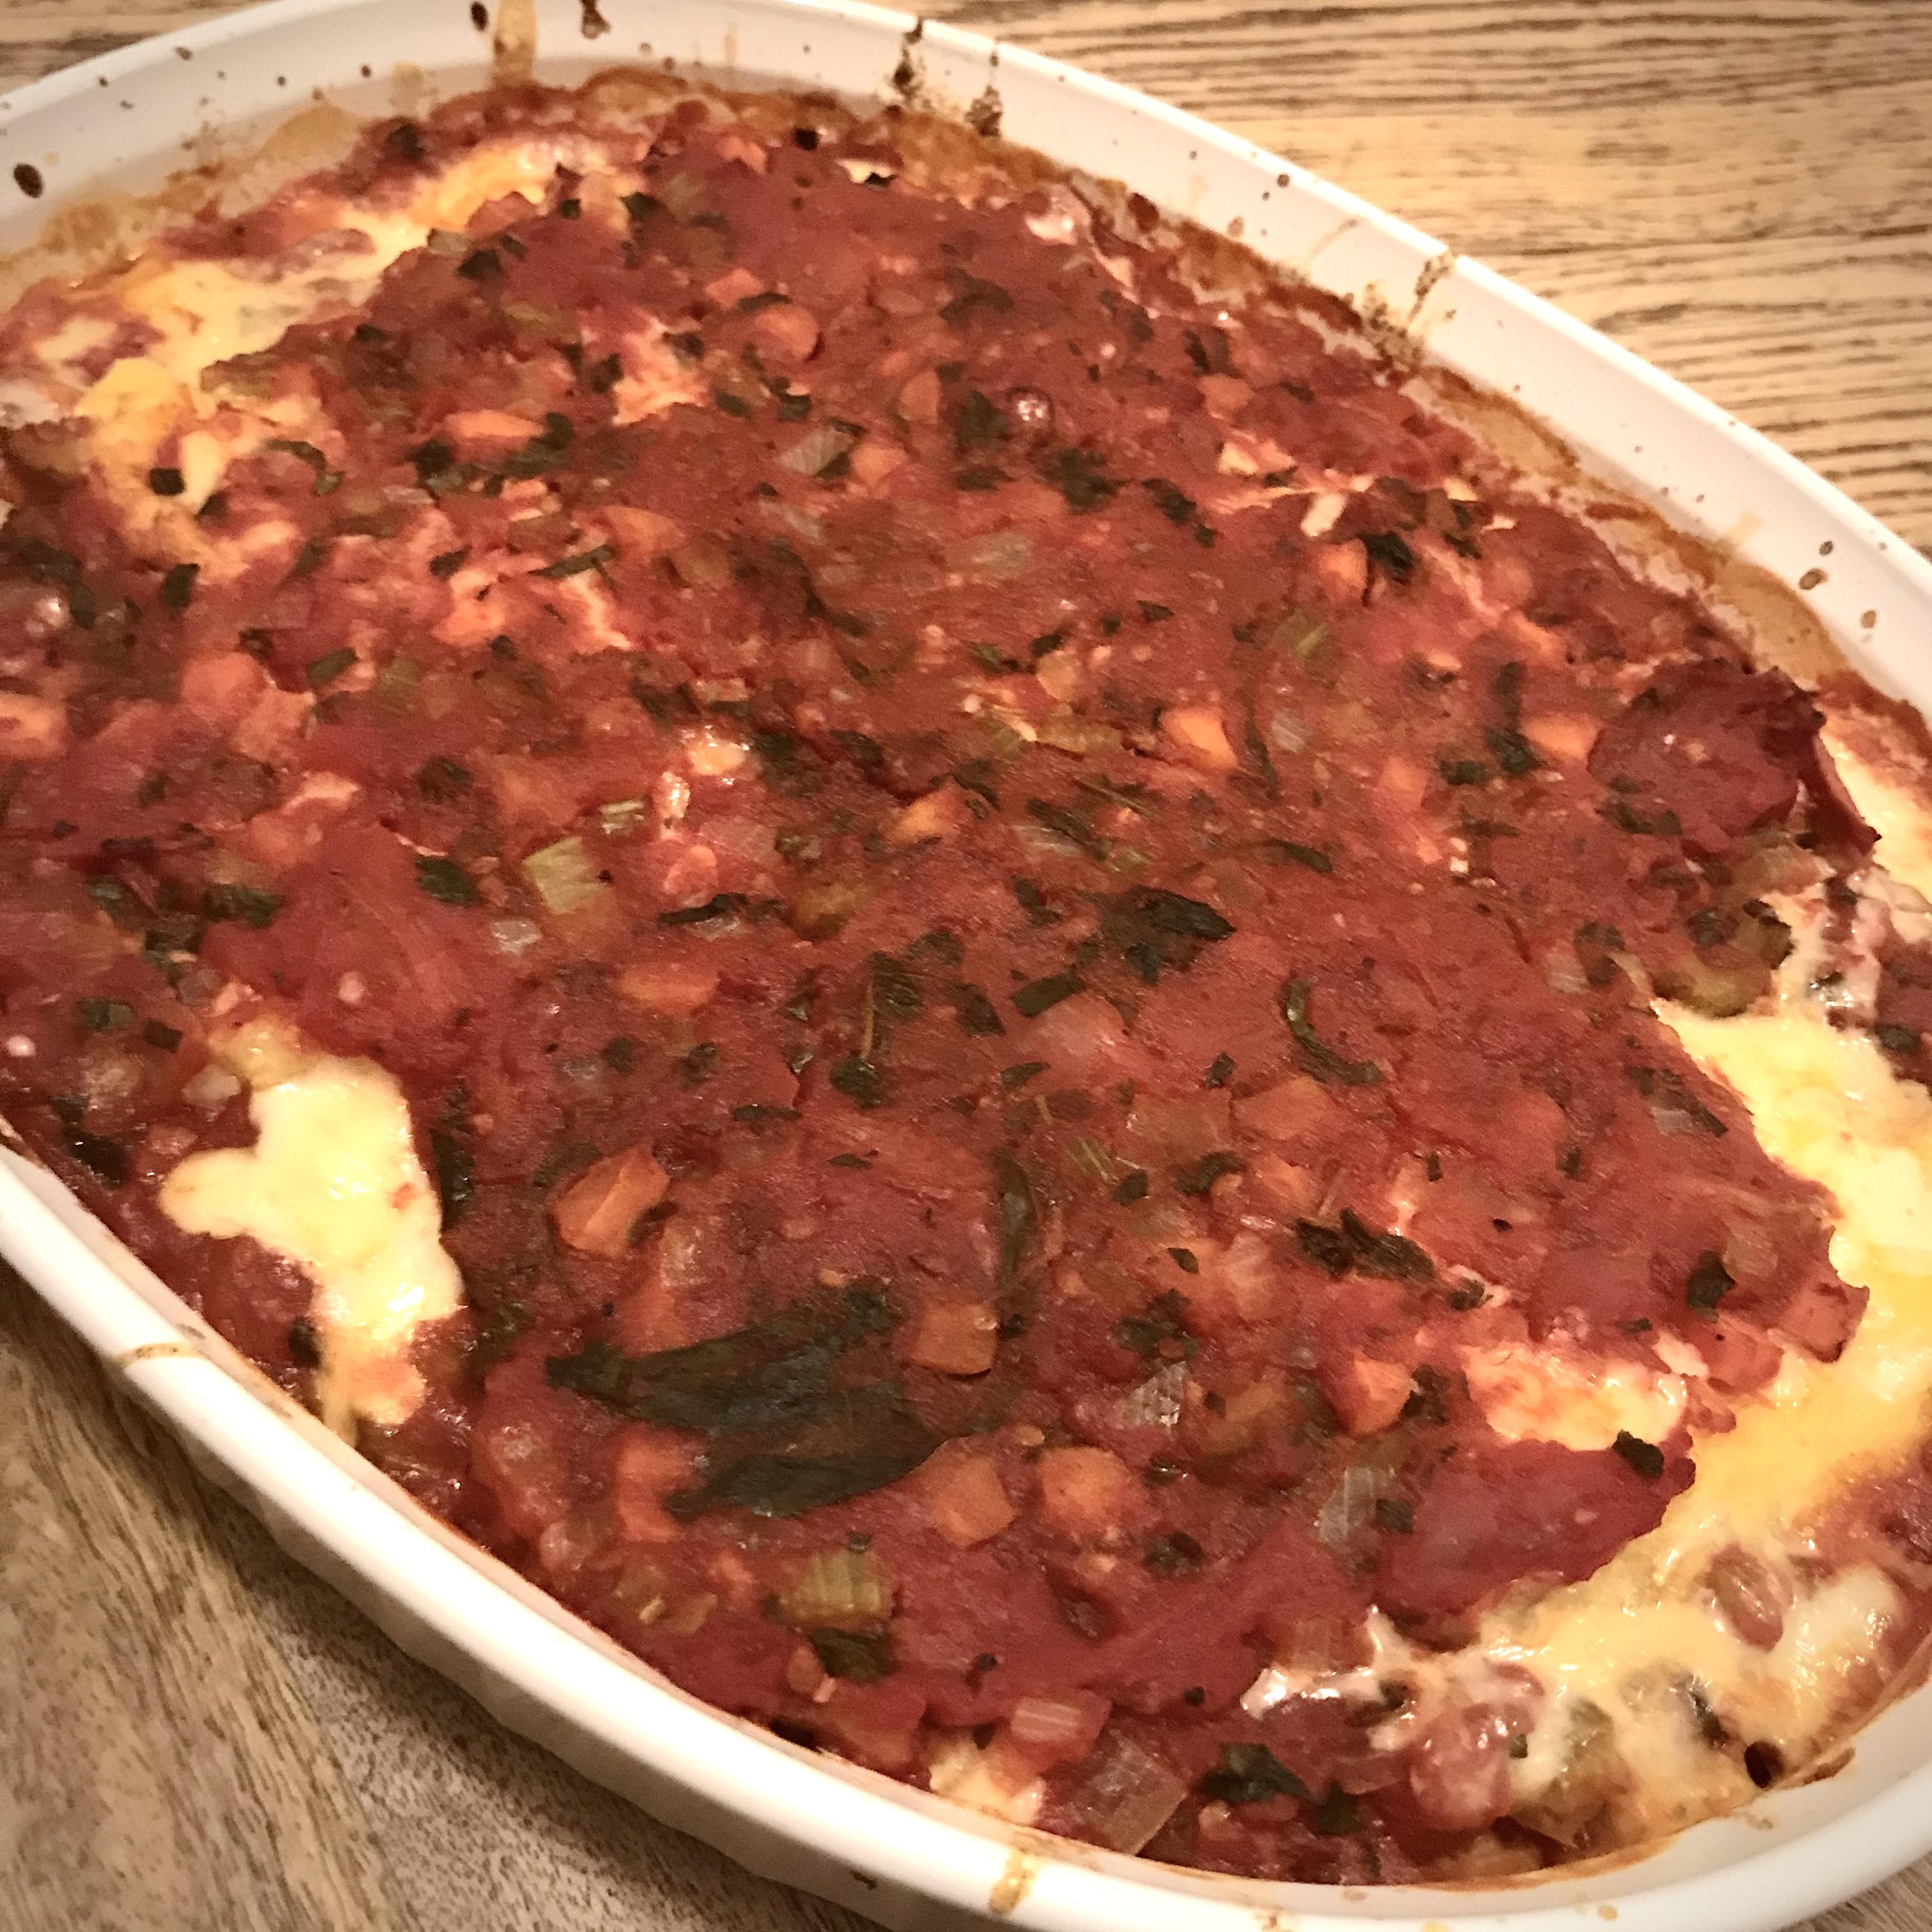 Baked Polenta with Tomato Sauce